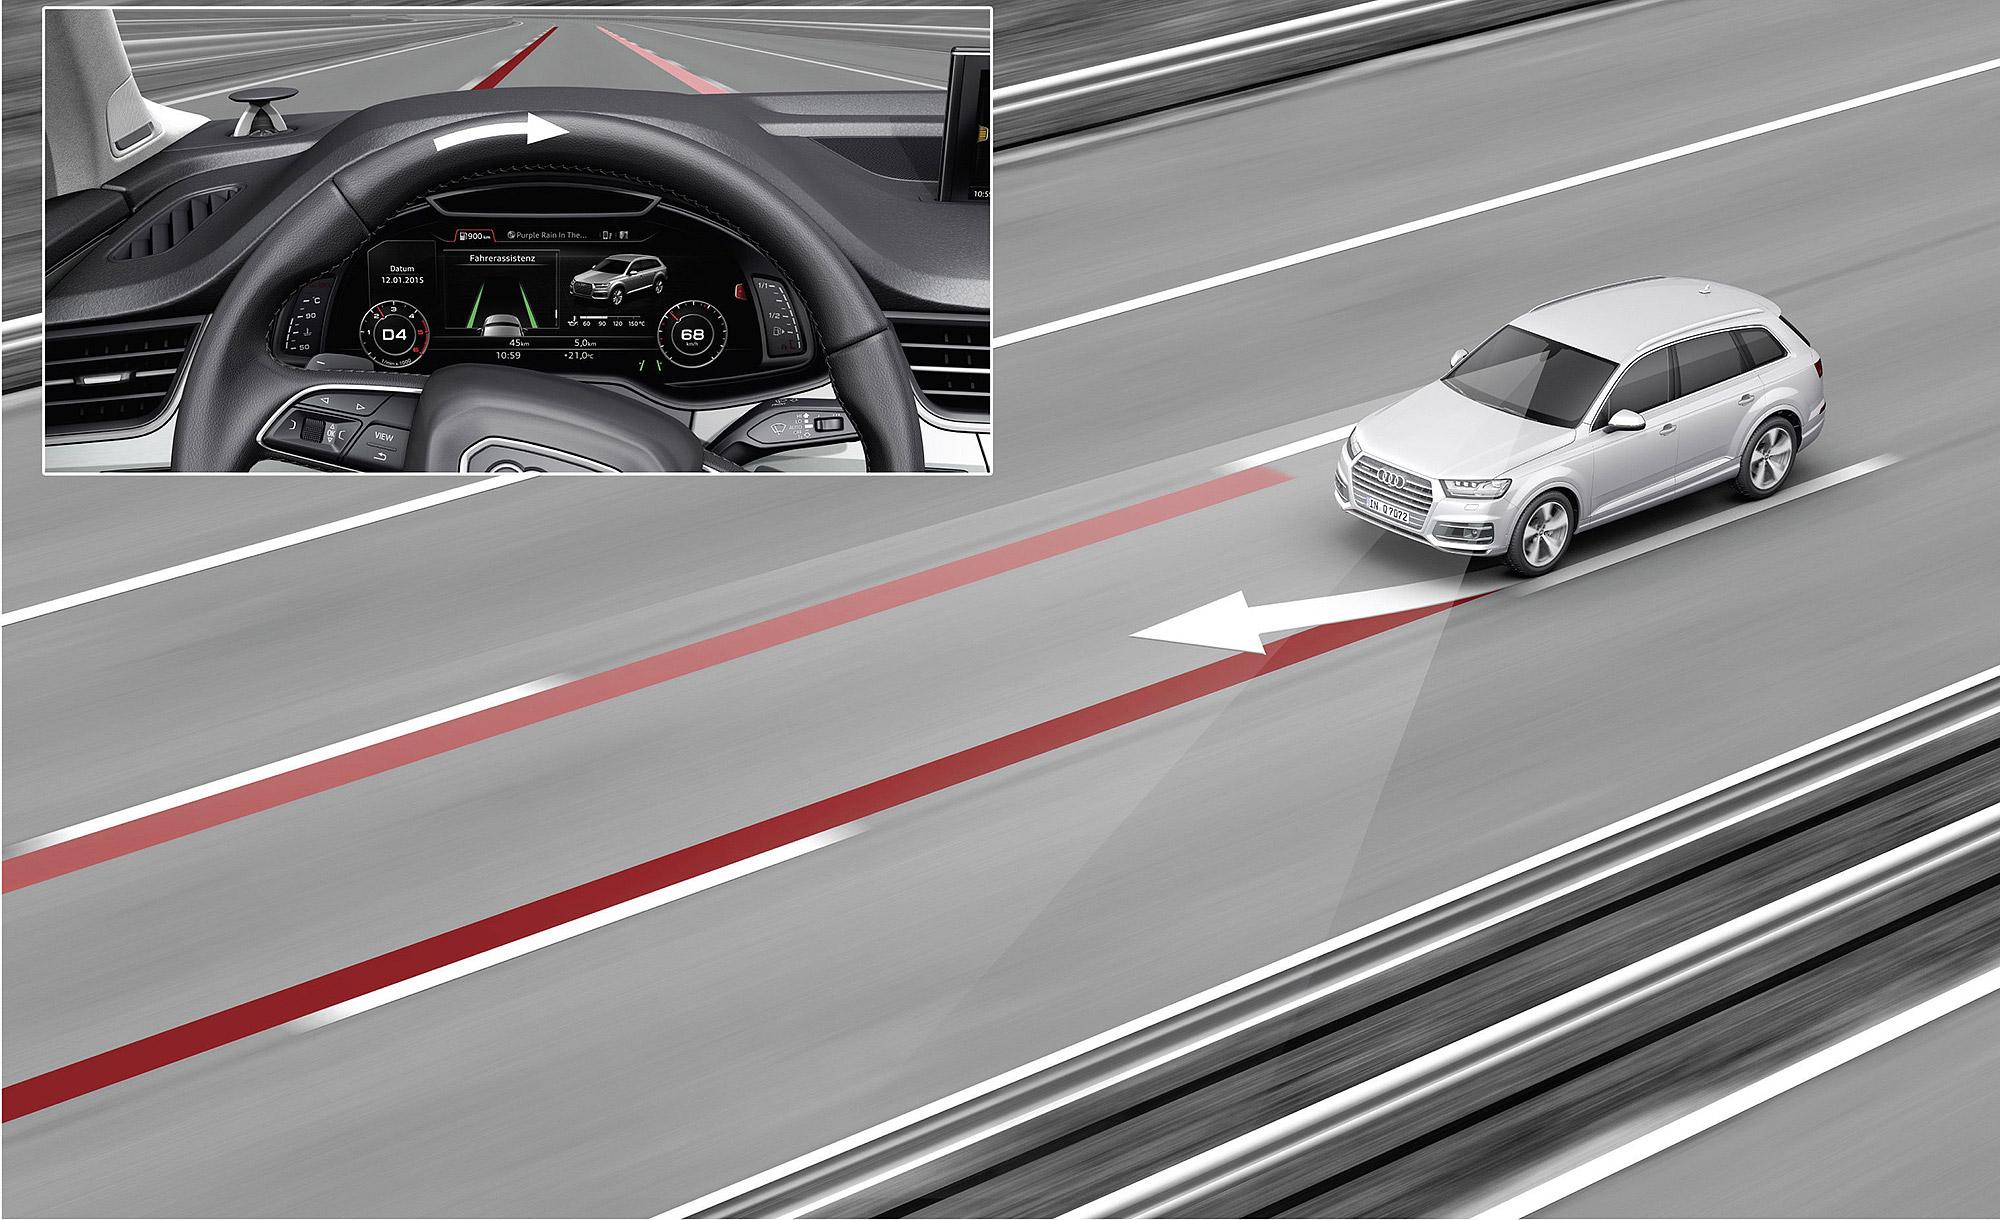 Audi Side Assist 主動式車道維持與及偏離警示系統目前已大量配置在 Audi Taiwan 旗下的產品之中。